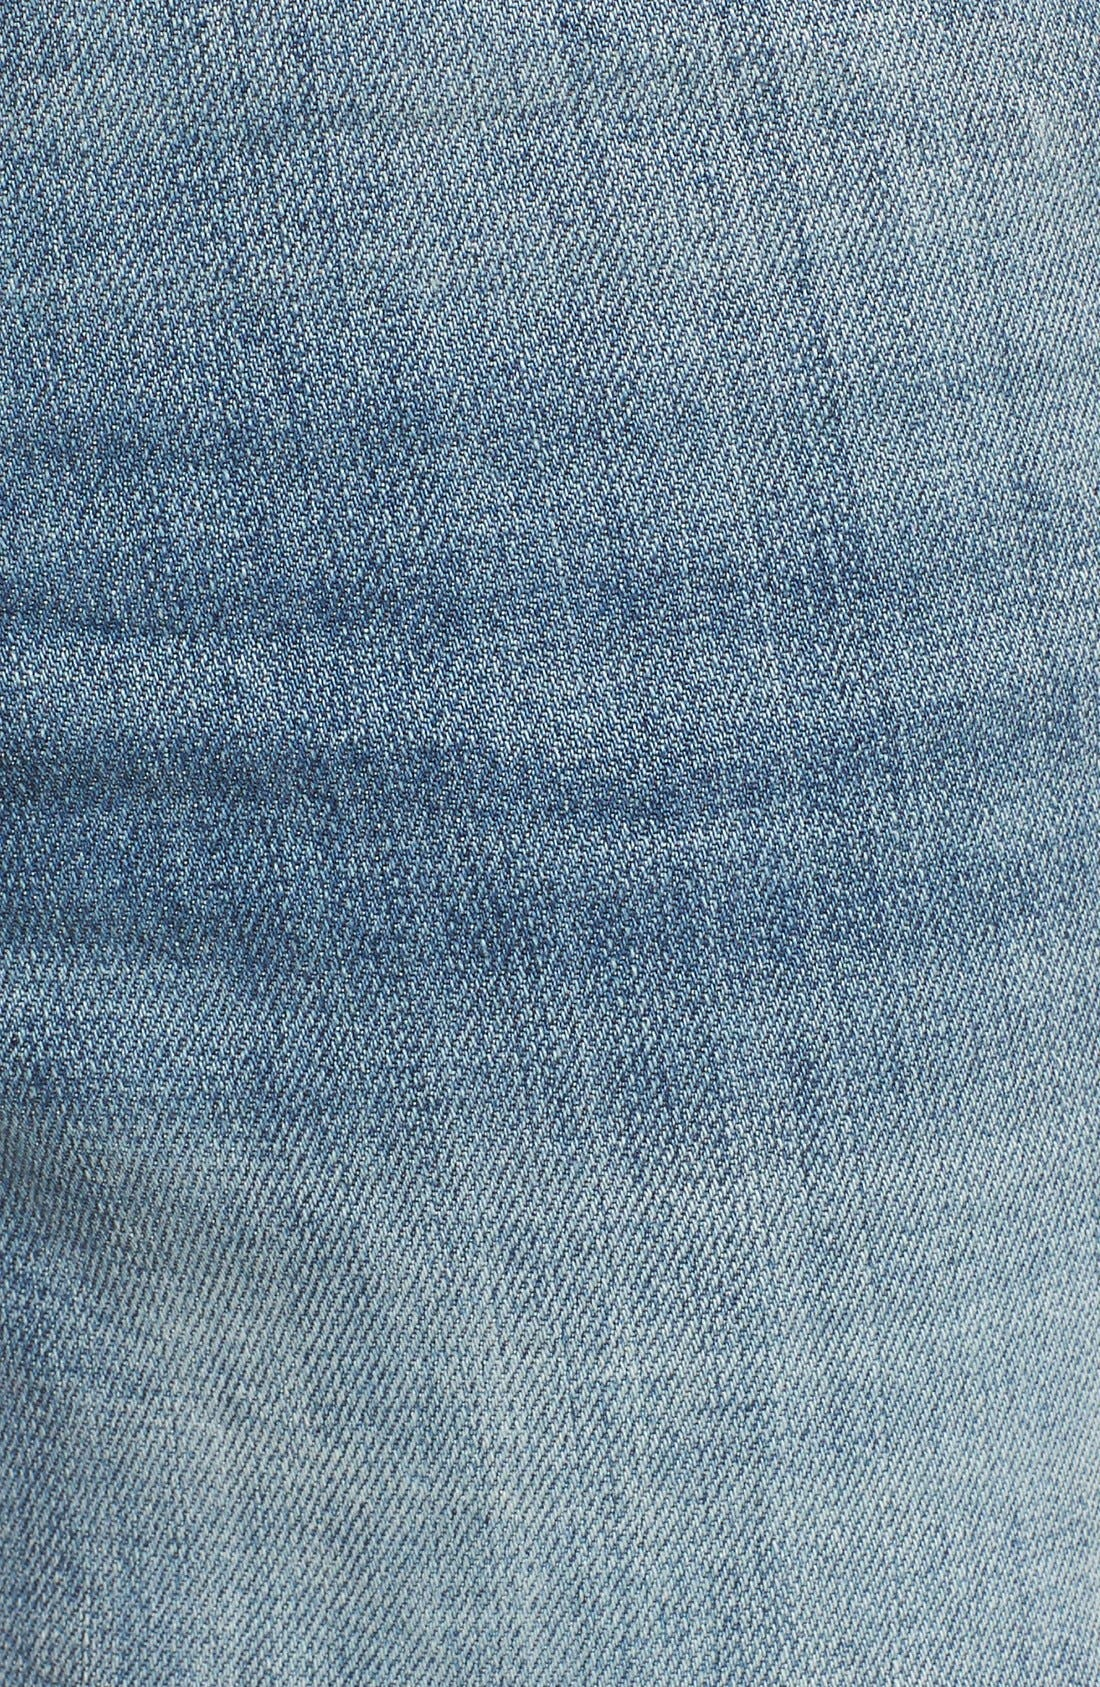 'Gidget' Denim Cutoff Shorts,                             Alternate thumbnail 5, color,                             420